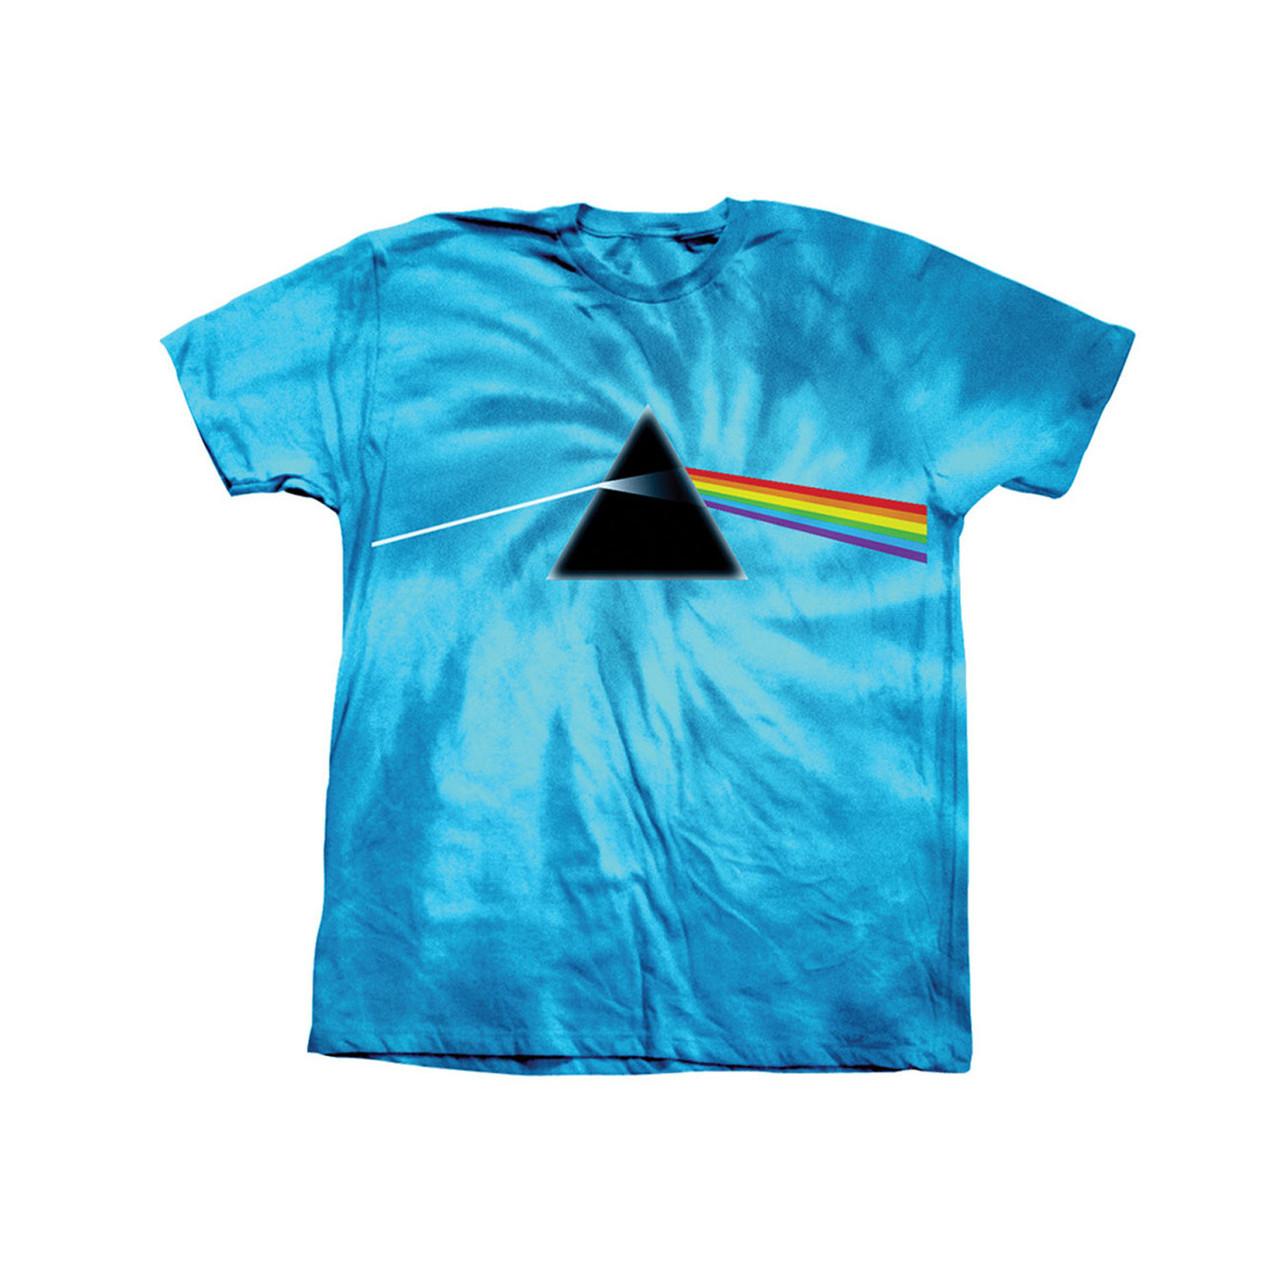 845f22a3 Habitat X Pink Floyd SHIRT DARK SIDE OF THE MOON TURQUOISE